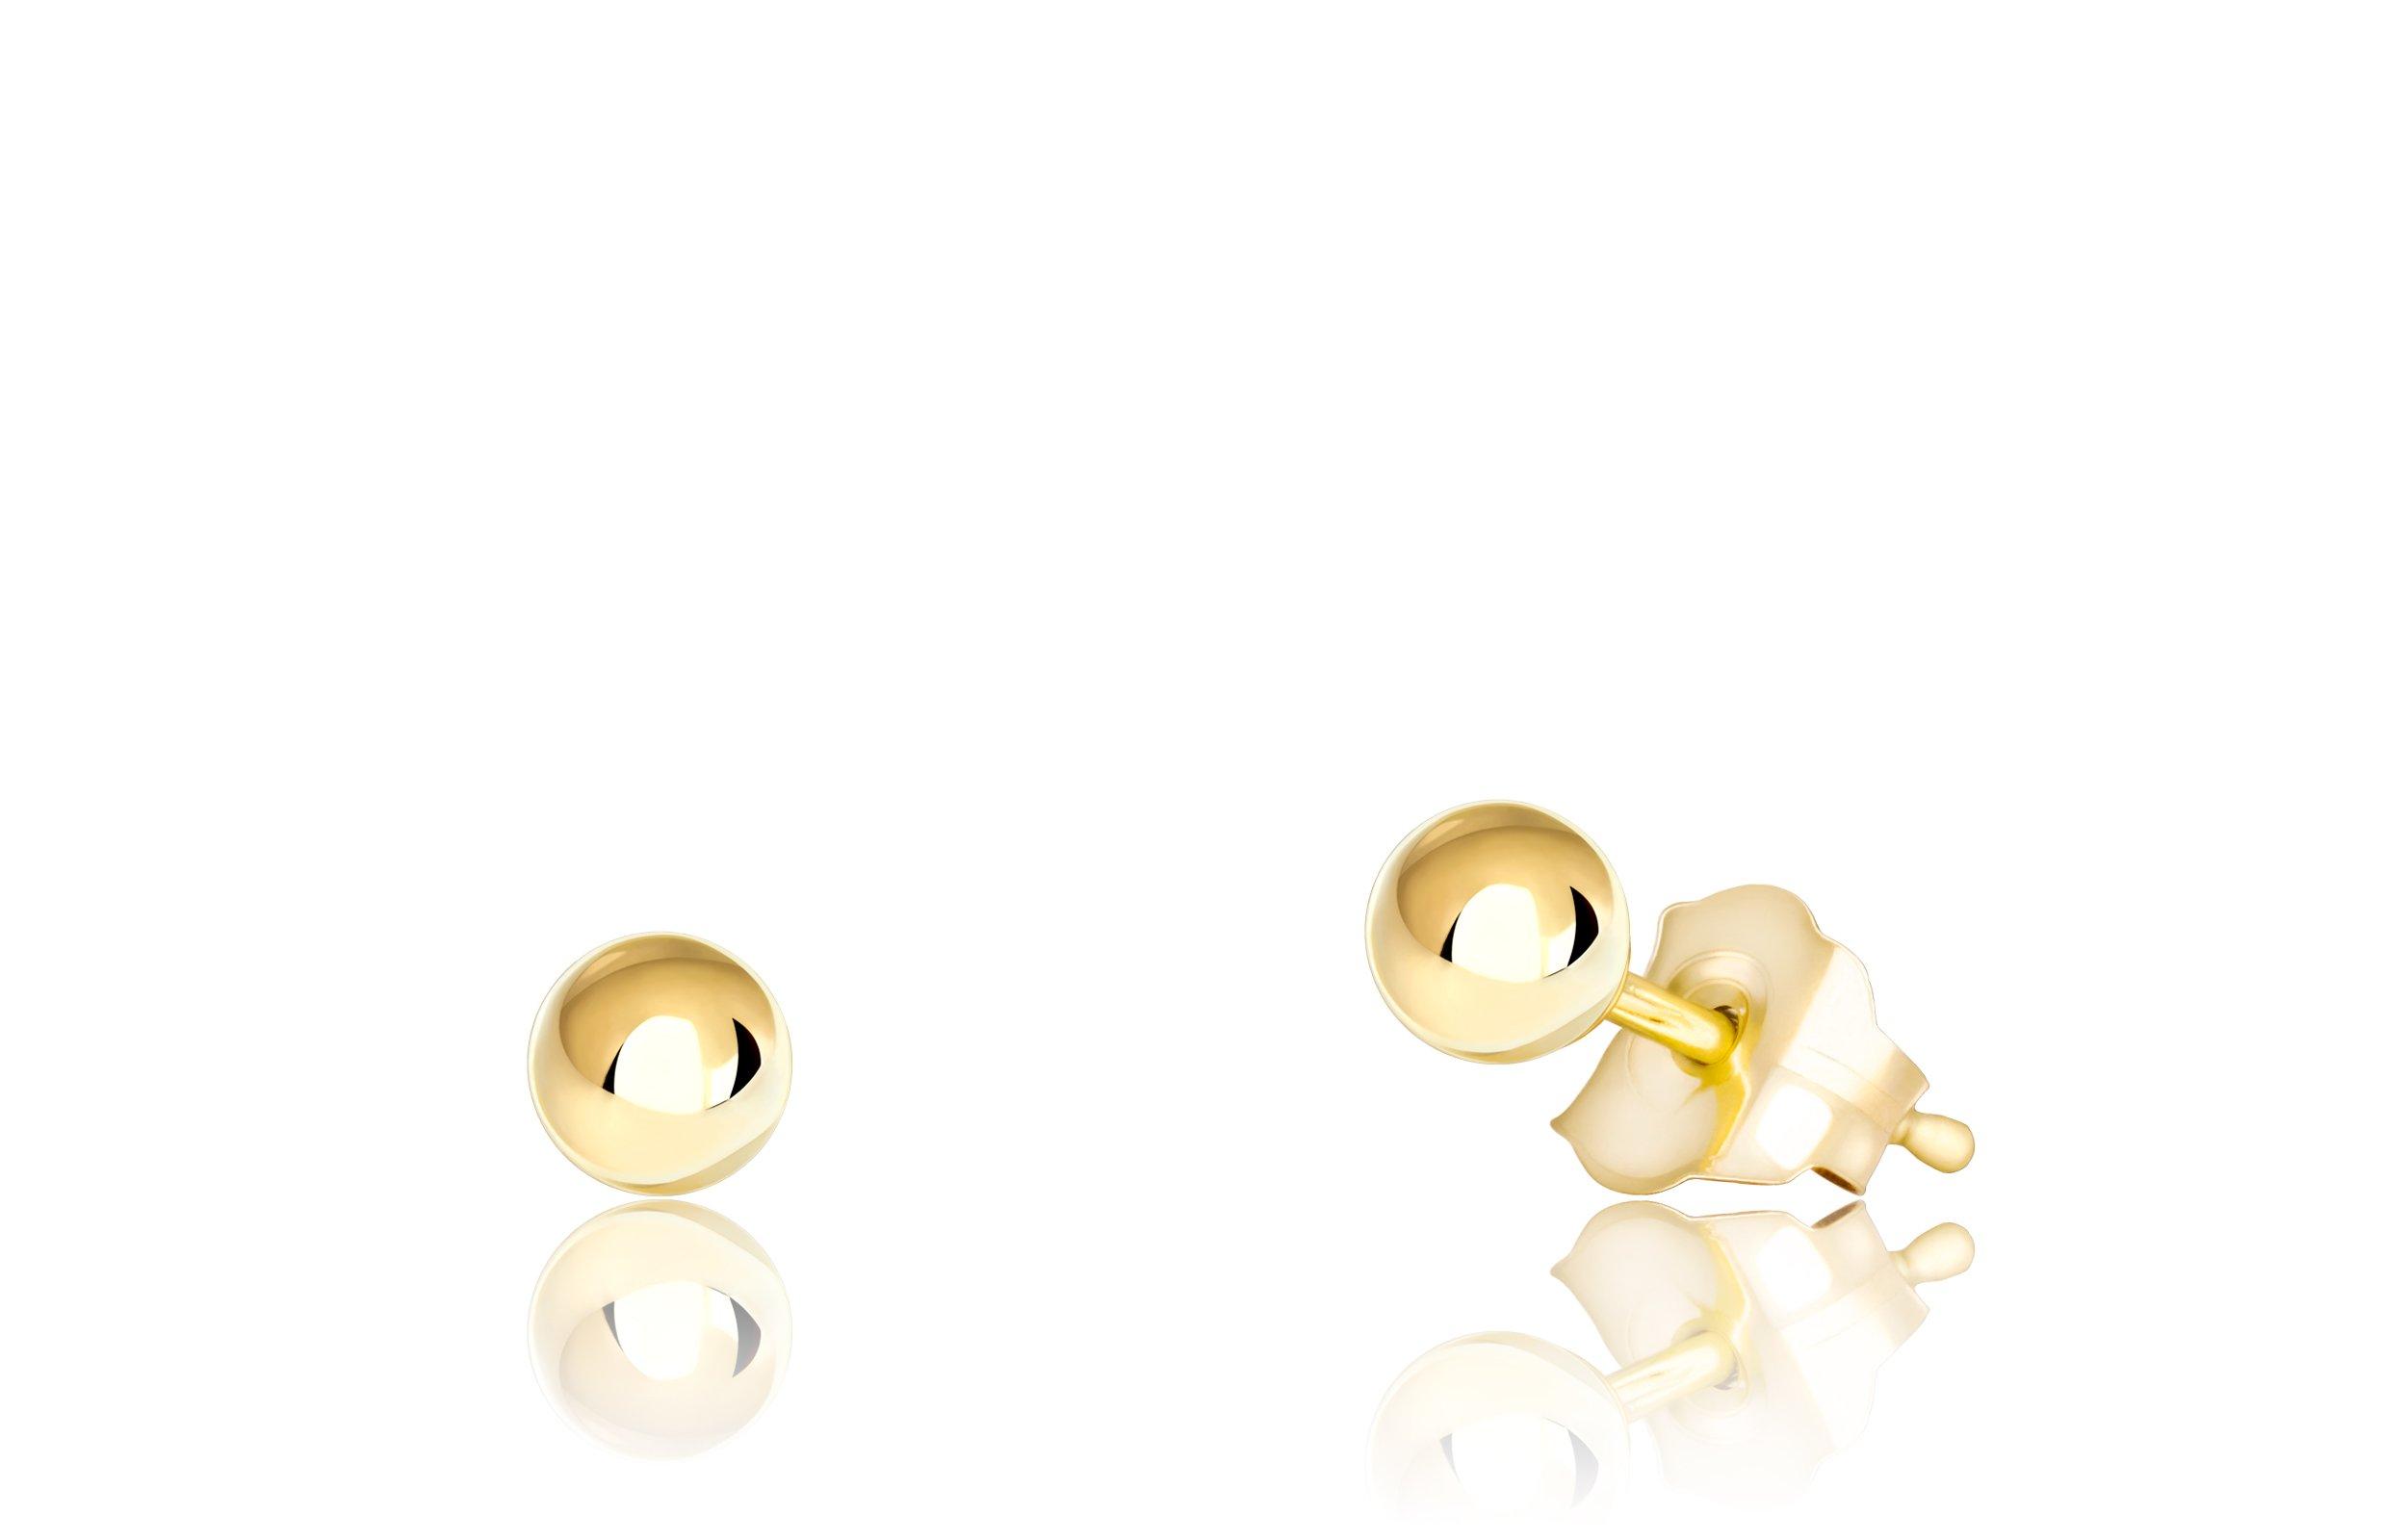 Premium 14K Yellow Gold Ball Stud Earrings (3mm - Yellow Gold)